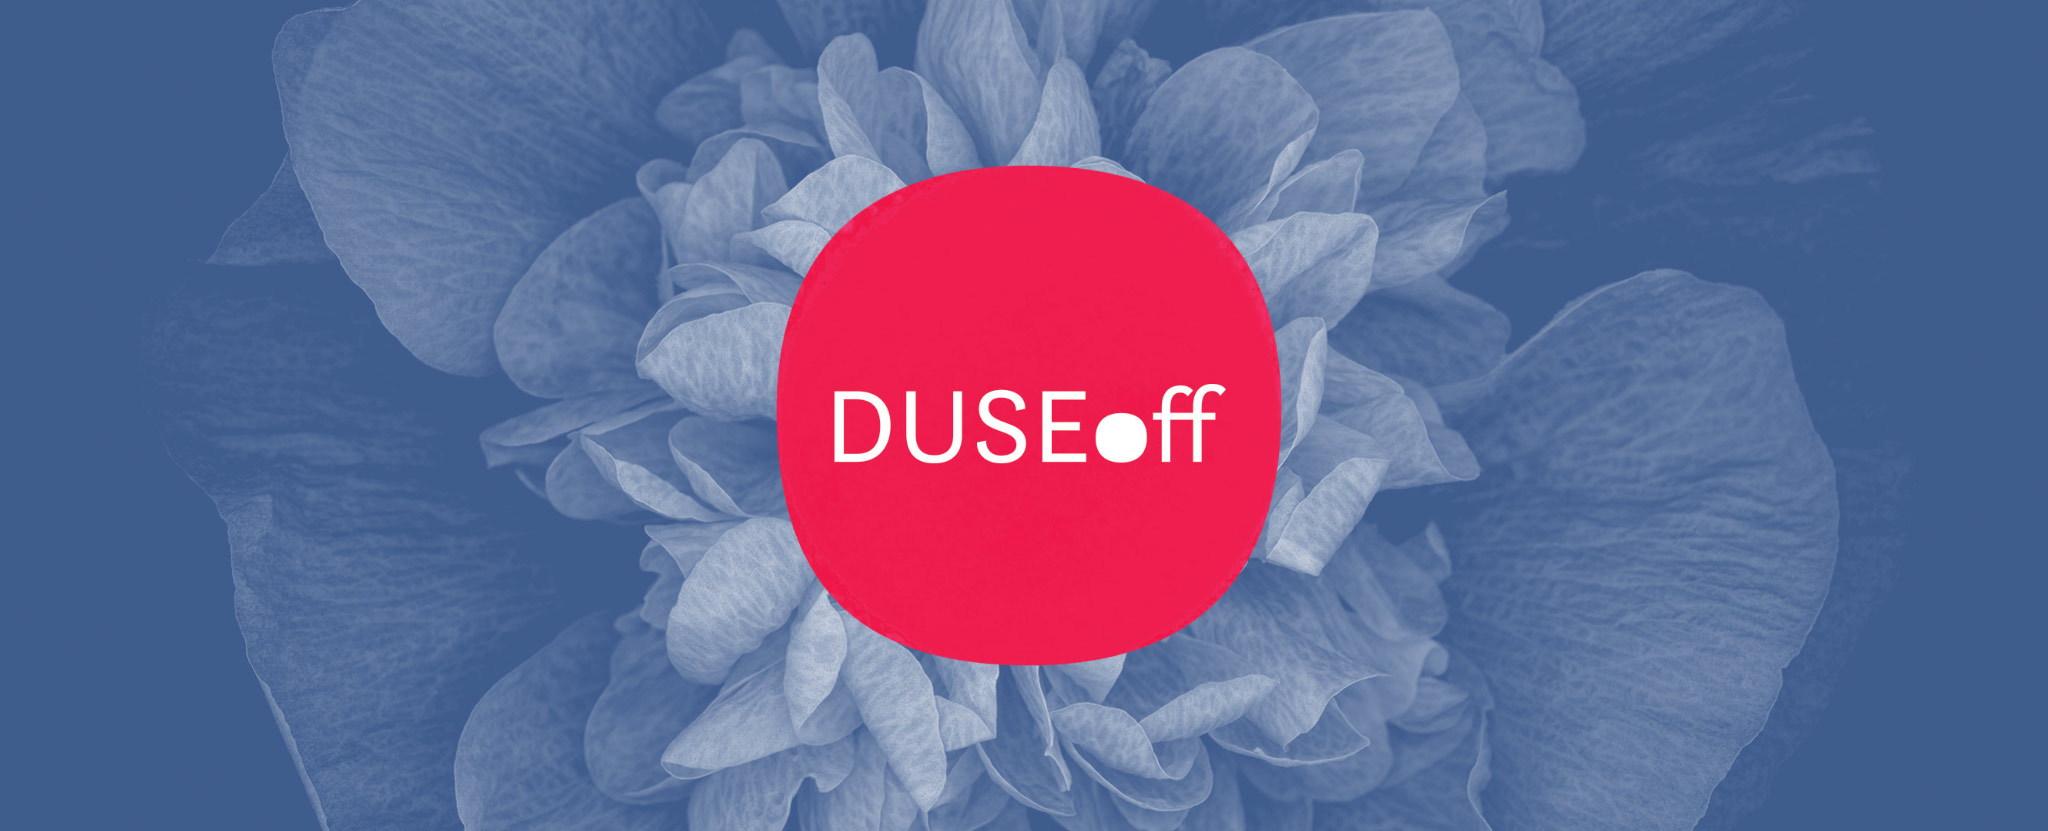 DUSEoff